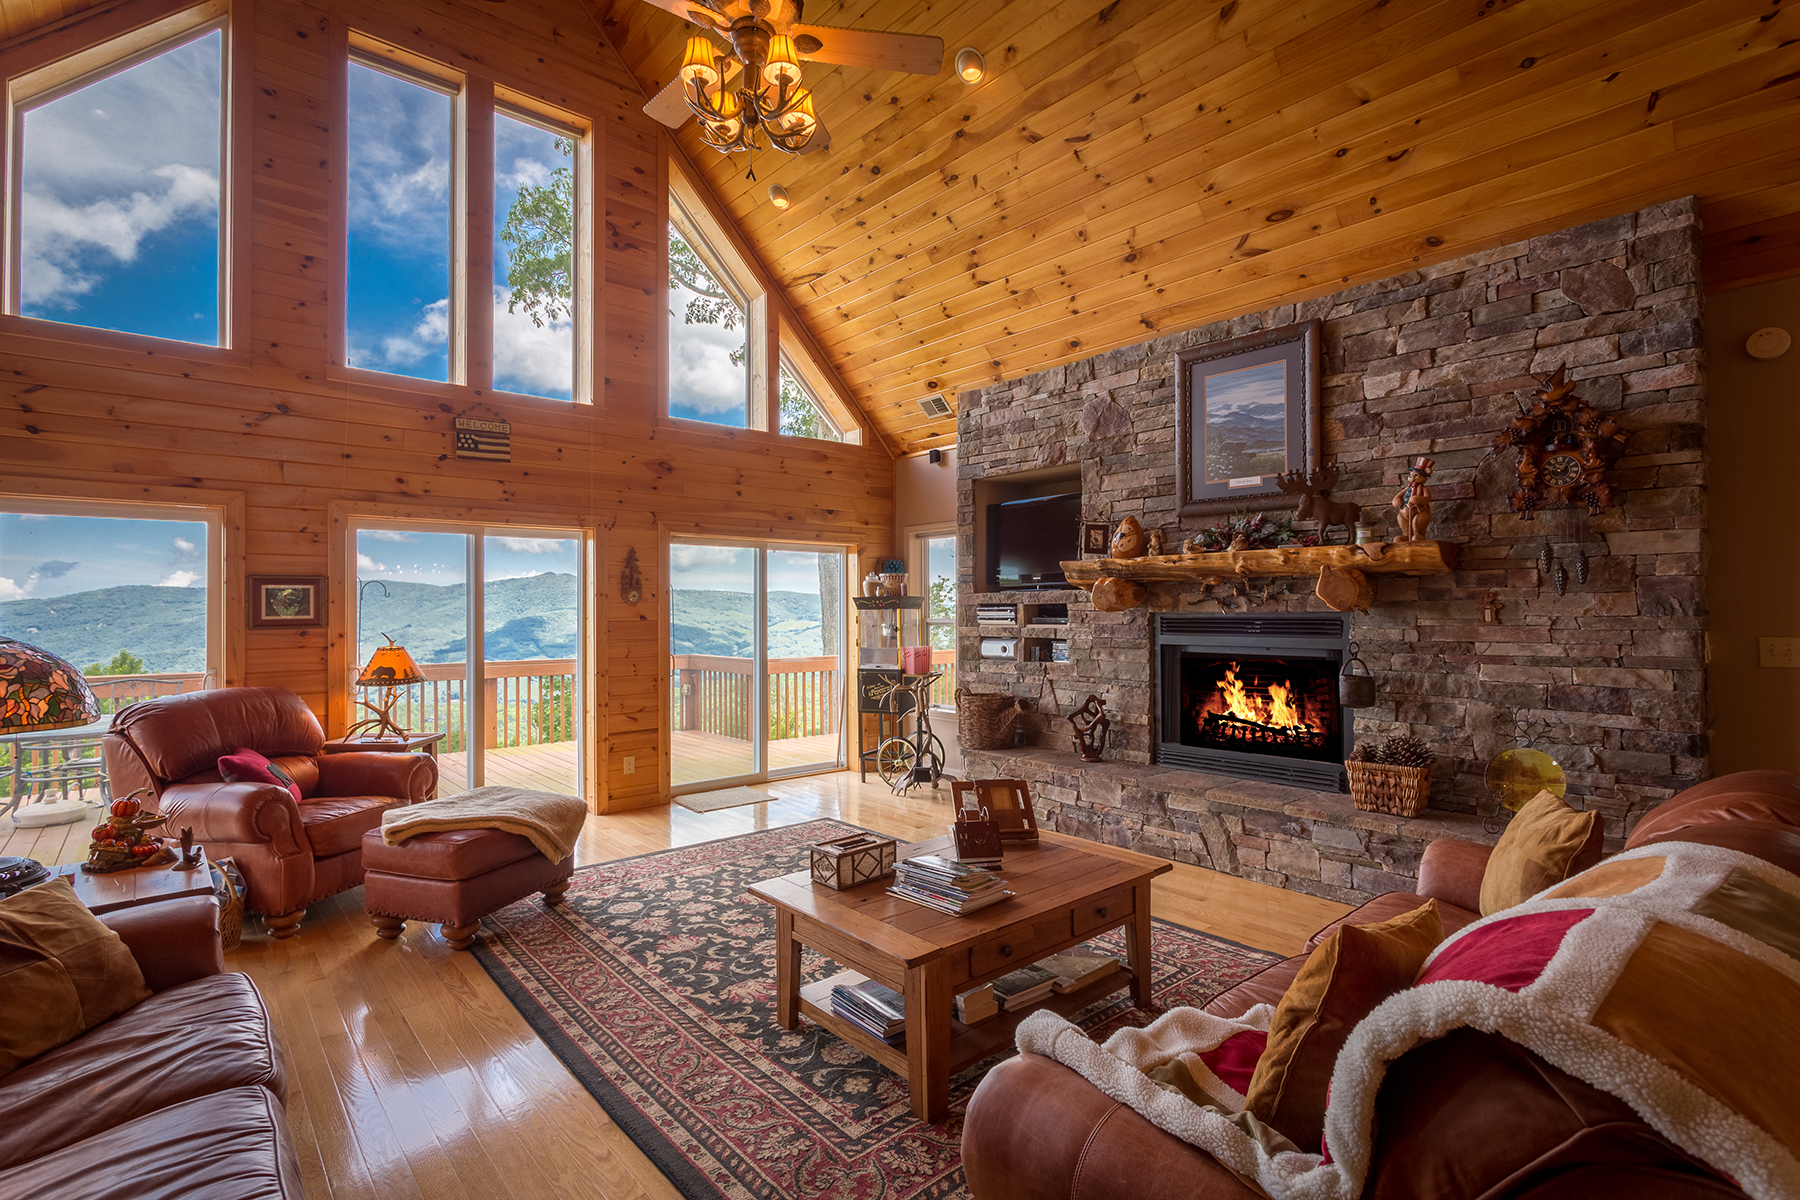 Casa para uma família para Venda às Banner Elk - Mountain Meadows 130 Summit Trail Banner Elk, Carolina Do Norte, 28604 Estados Unidos